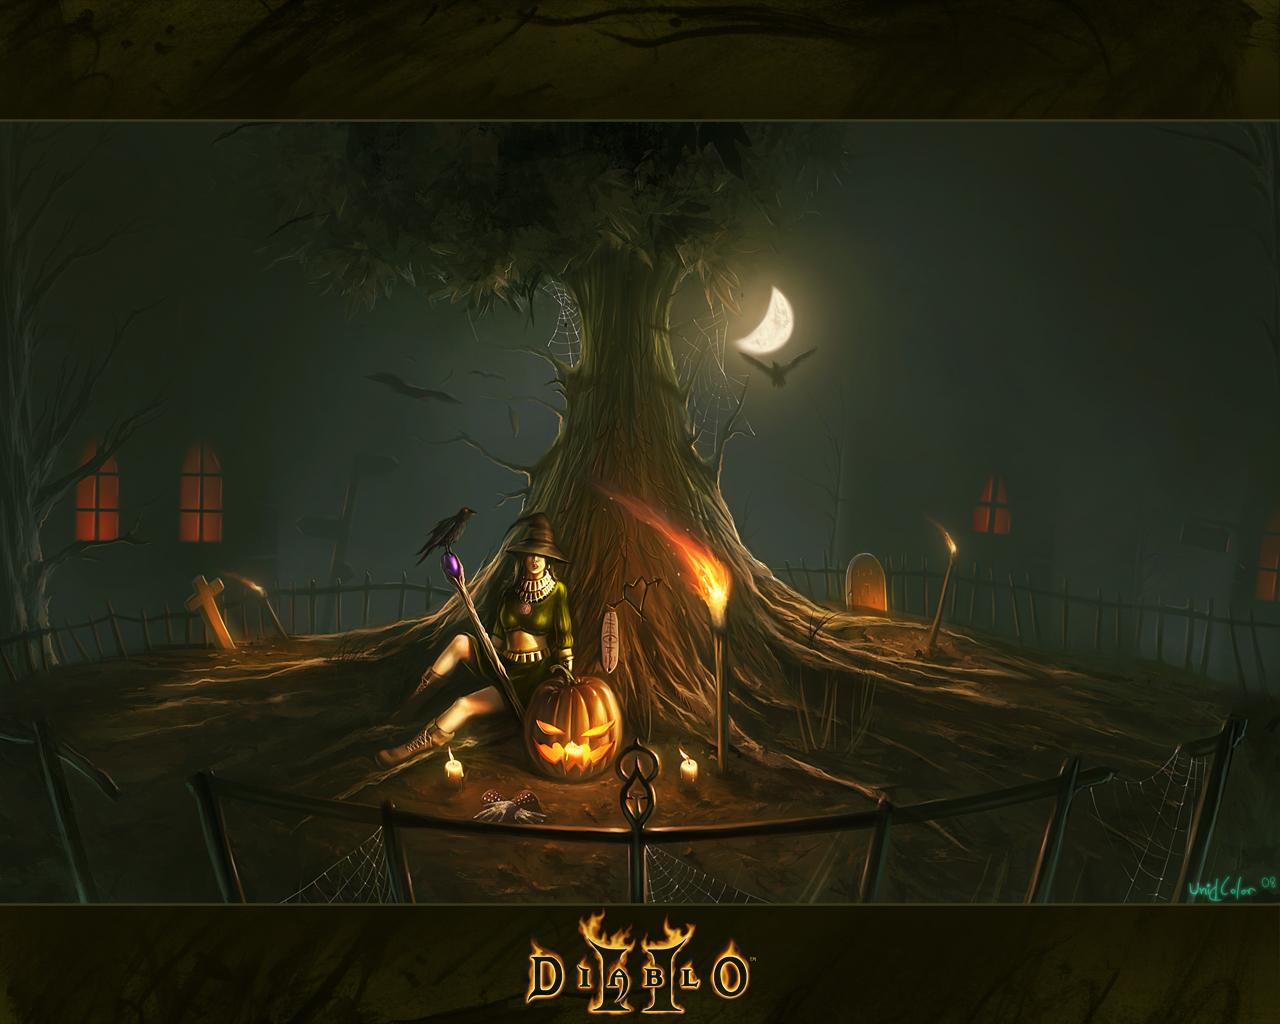 Top Wallpaper Halloween Spooky - sorceress-wallpaper-with-a-creepy-tree  Image_19732.jpg